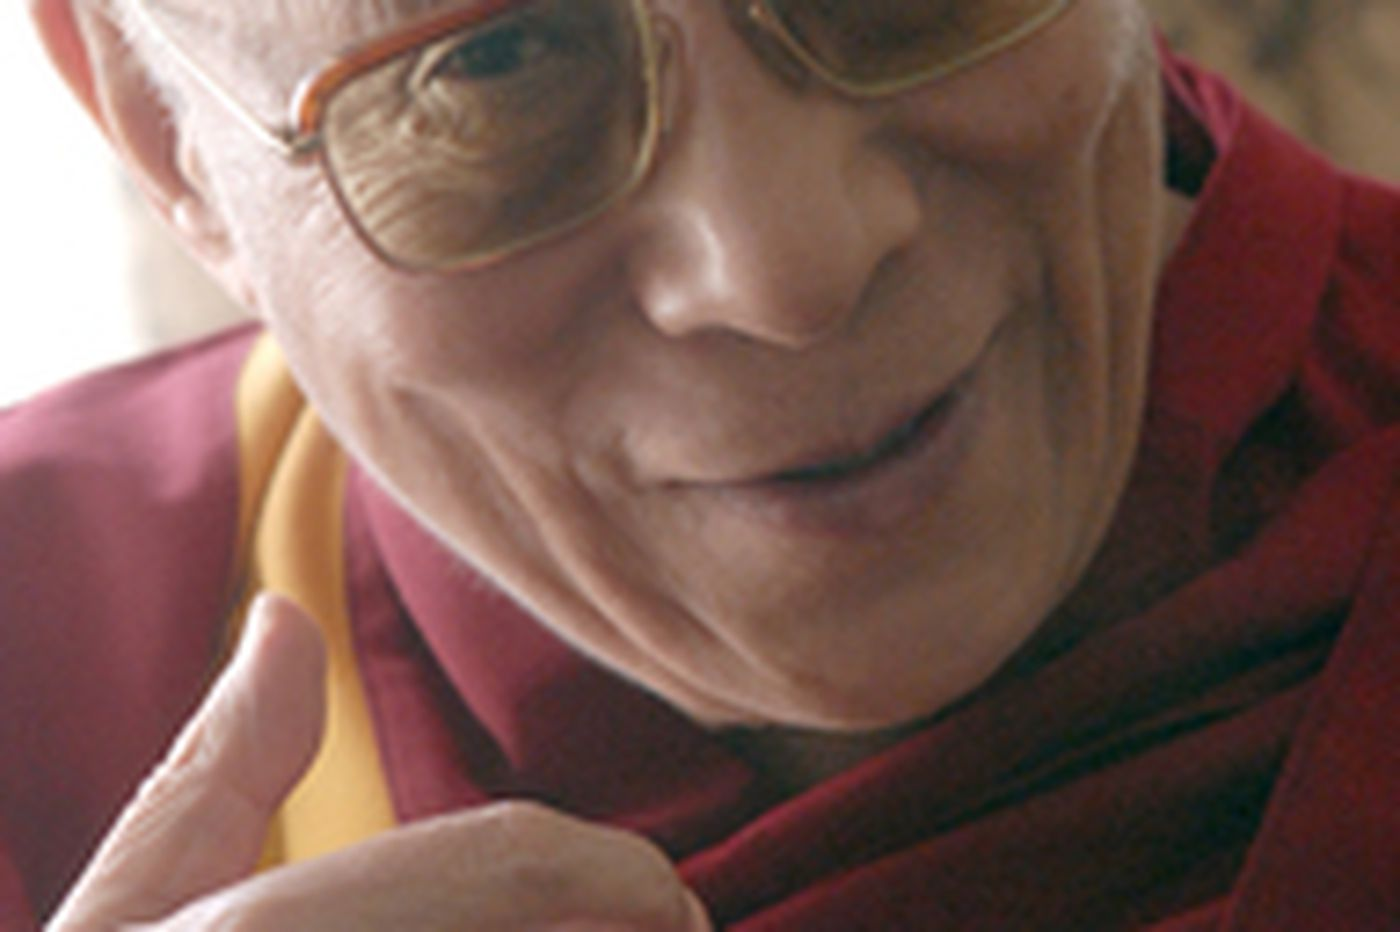 Dalai Lama describes himself as 'just one monk'